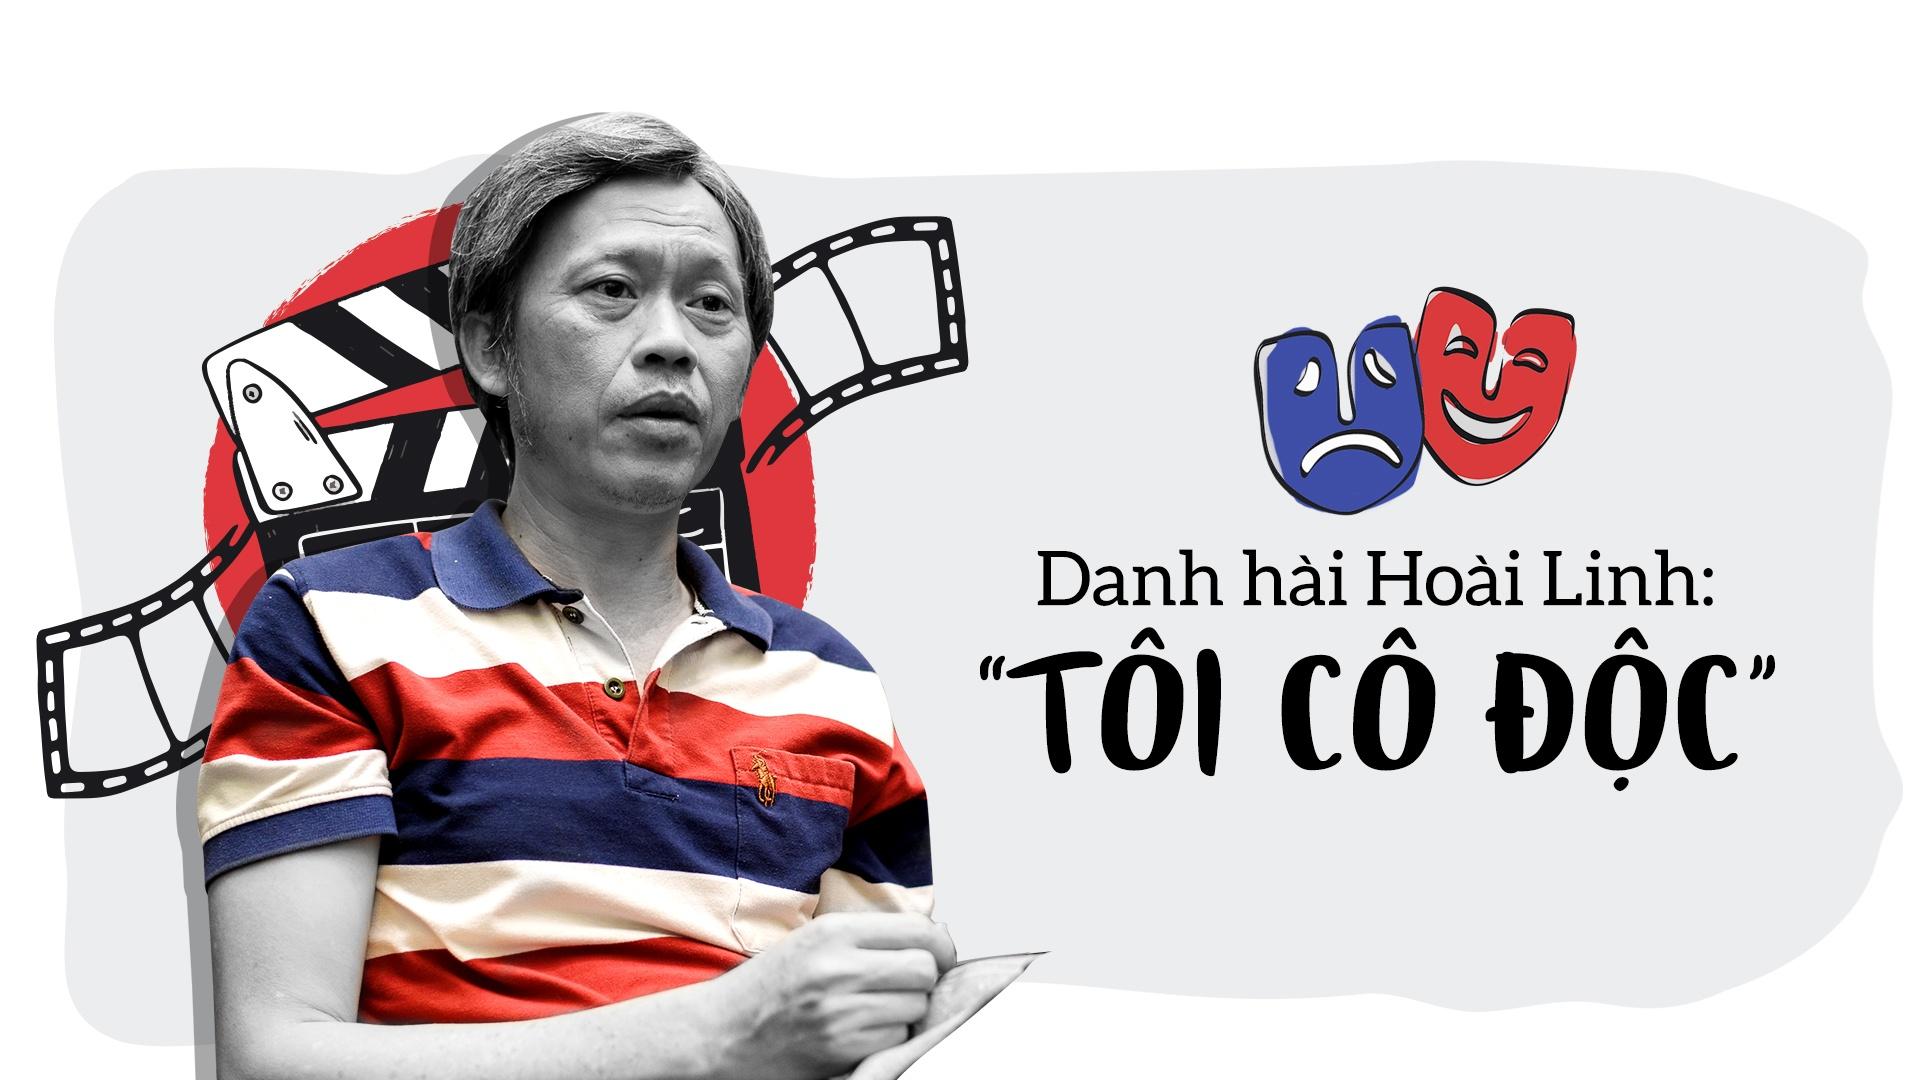 Hoai Linh co doc anh 1